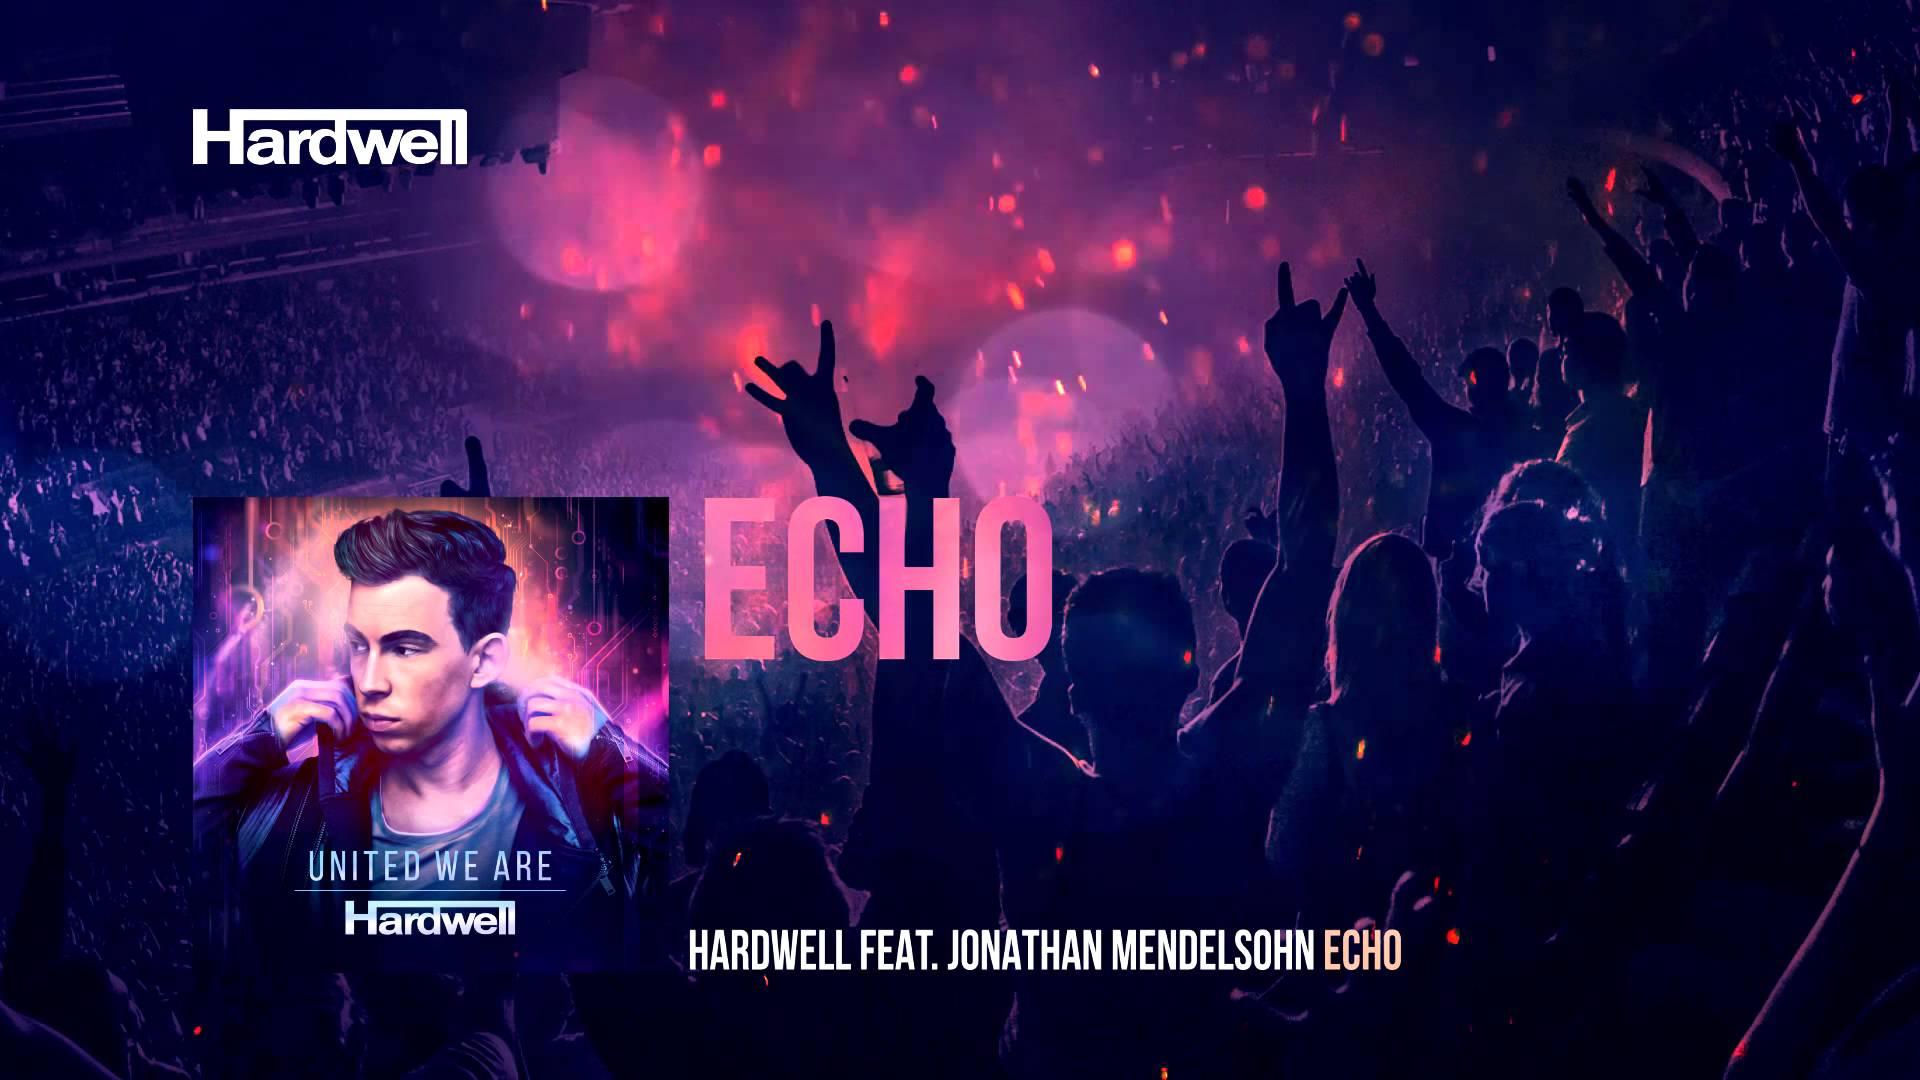 Hardwell feat. Jonathan Mendelsohn - Echo